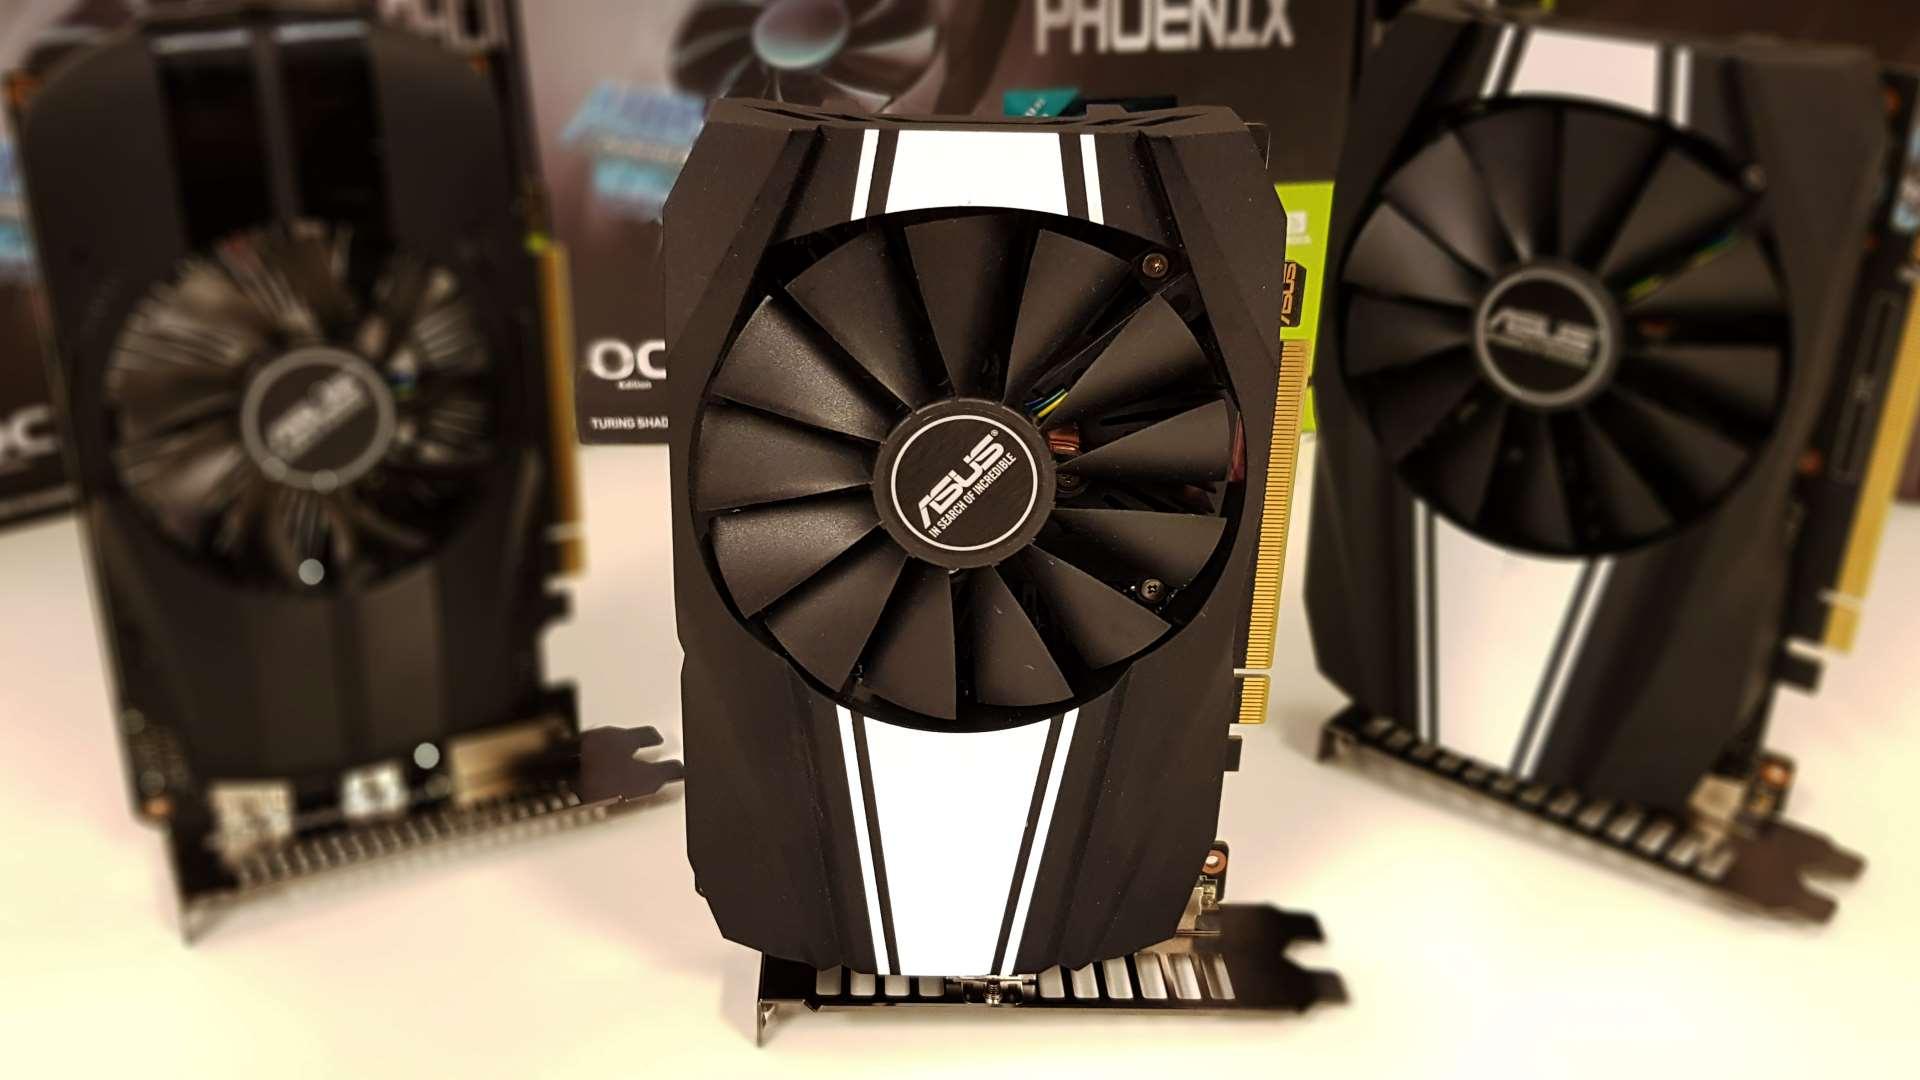 Nvidia GTX 1660 Ti, GTX 1660, or GTX 1650… should you buy a GeForce GTX Turing?